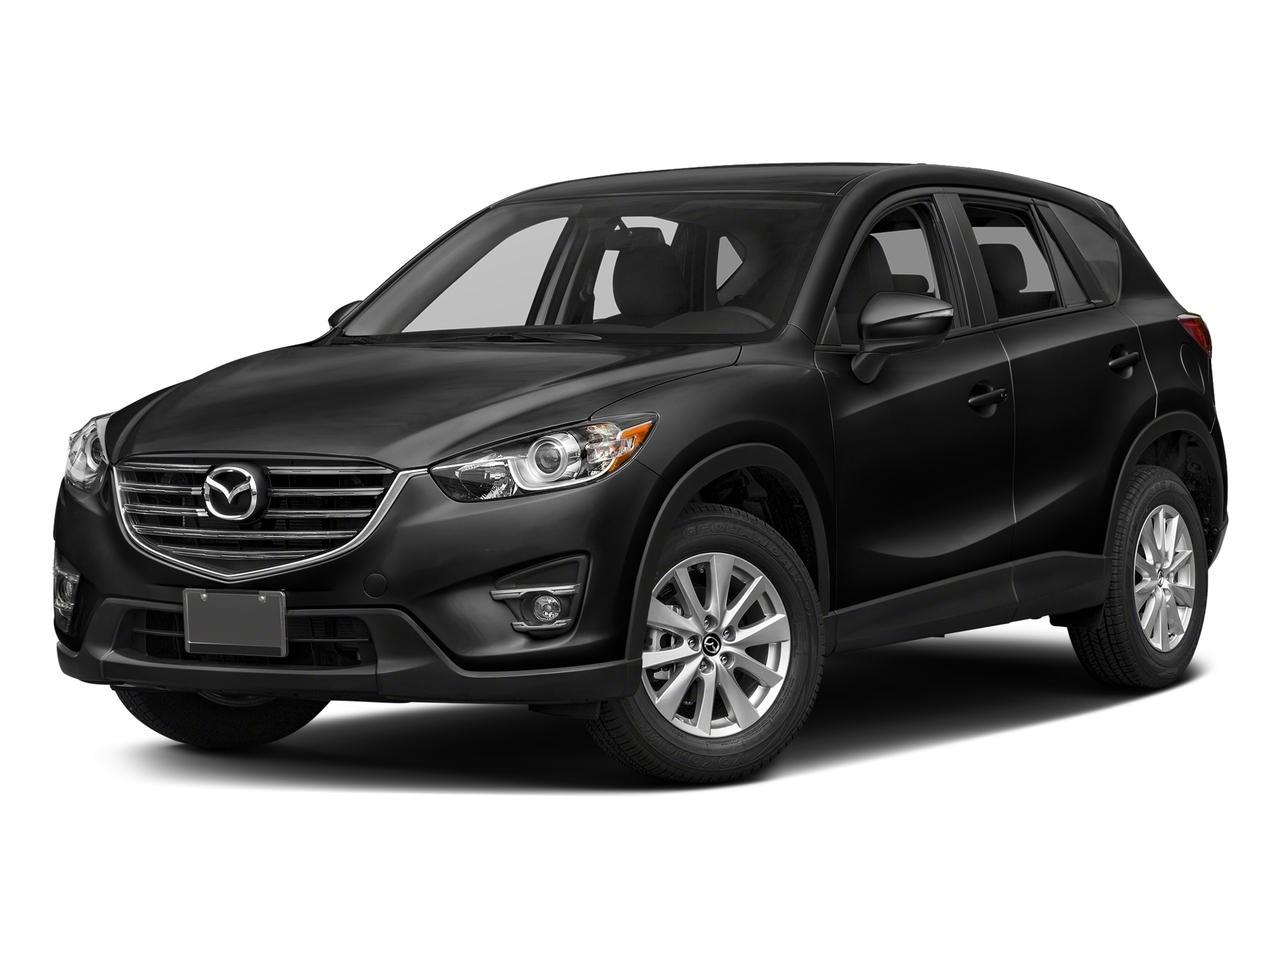 2016 Mazda CX-5 Vehicle Photo in Plainfield, IL 60586